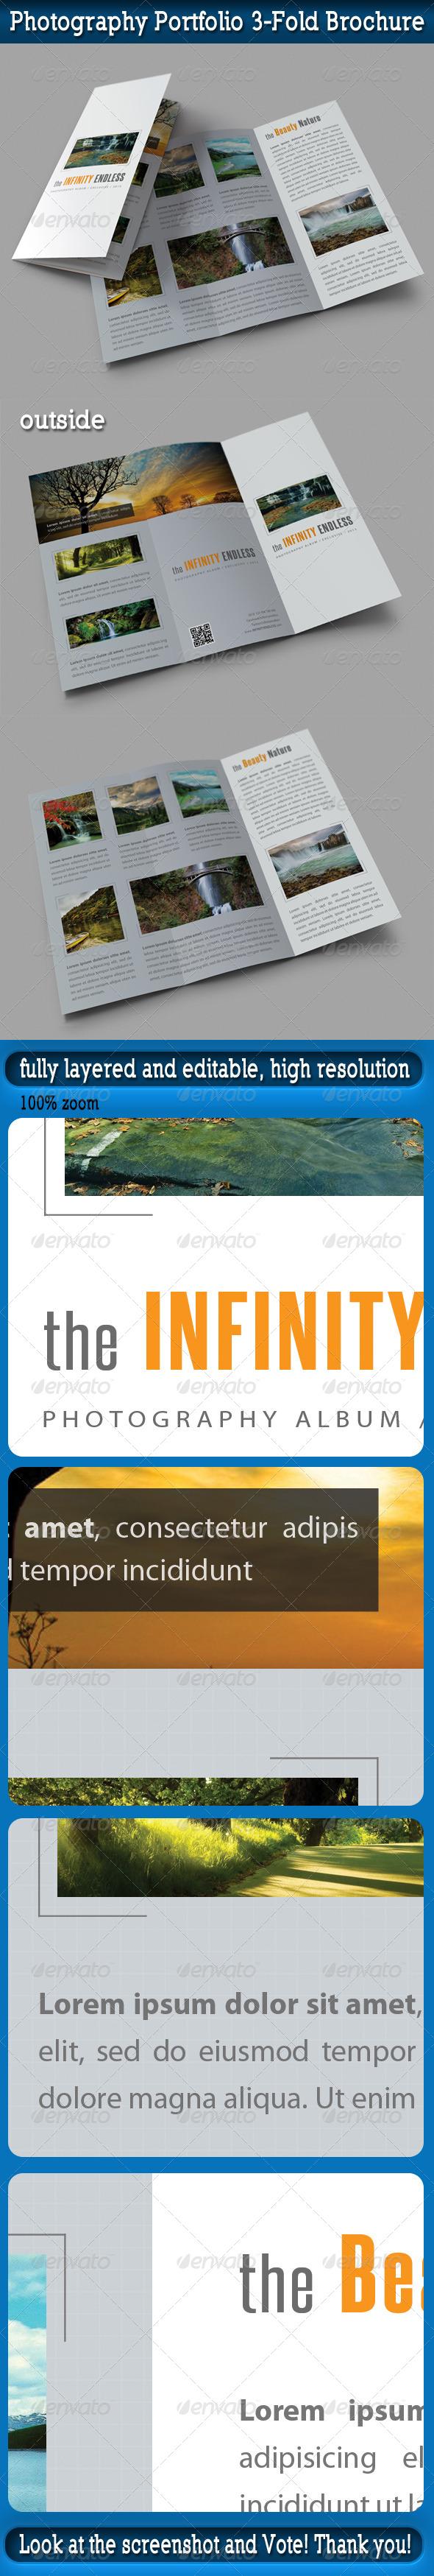 GraphicRiver Photography Portfolio 3-Fold Brochure 5138944